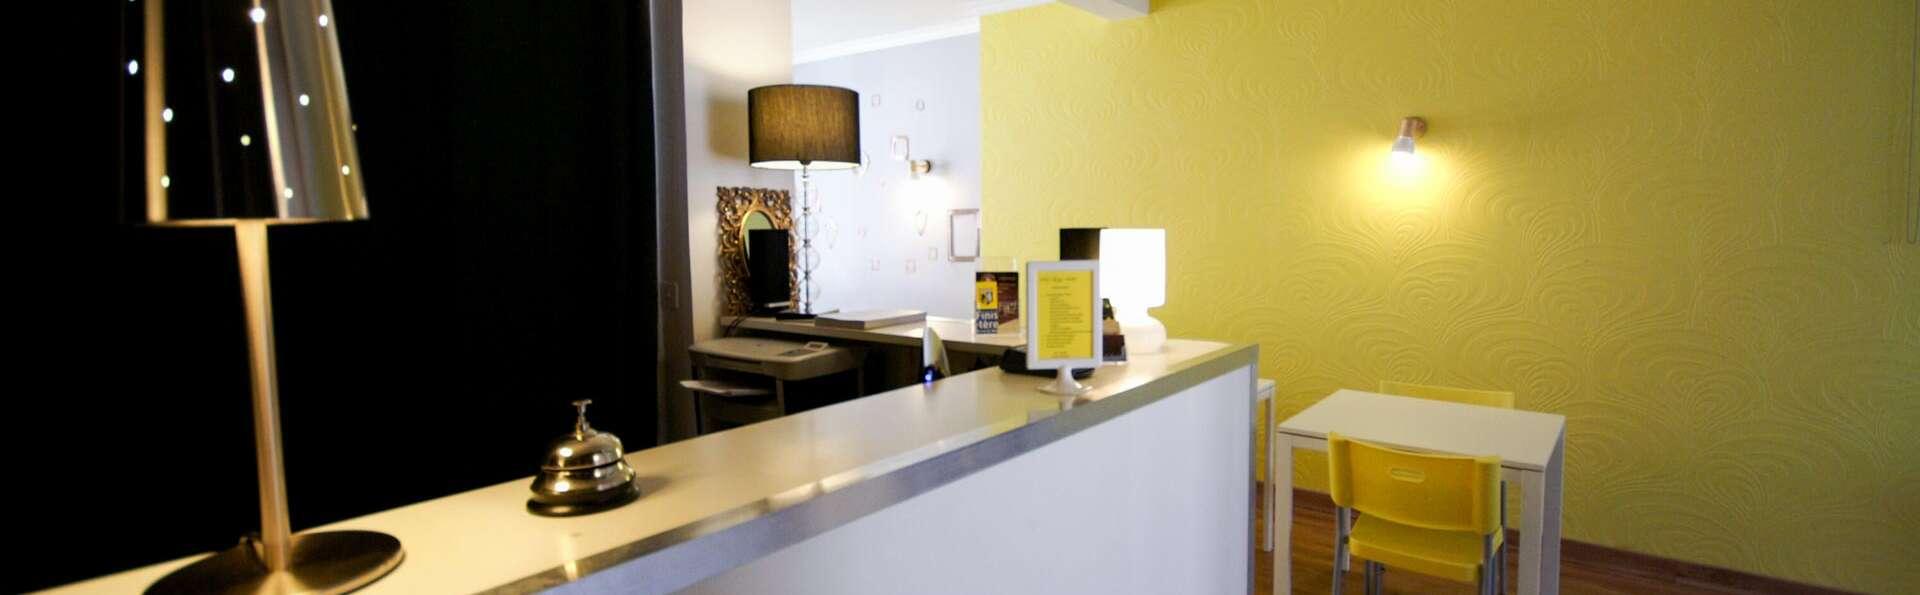 Hotel Little Lodge - EDIT_LOBBY_01.jpg